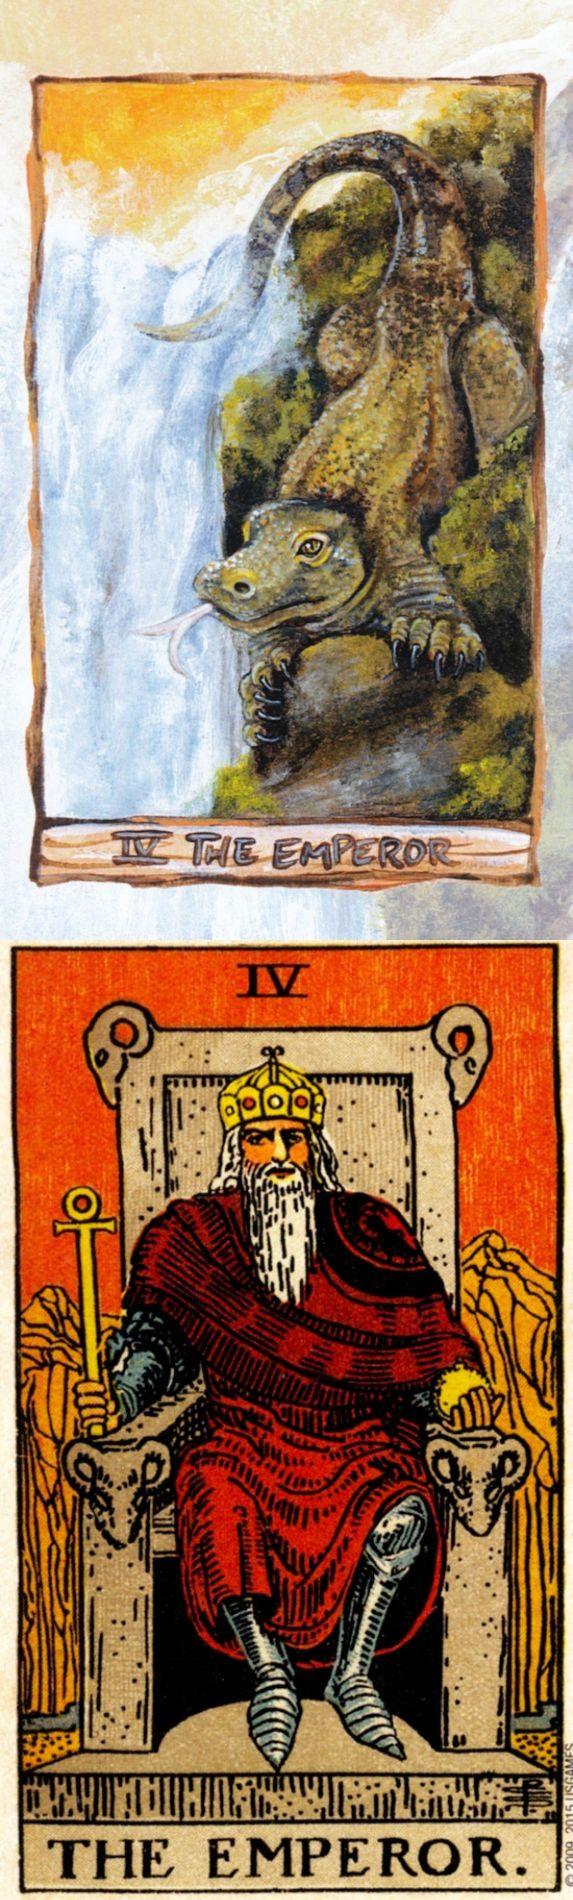 THE EMPEROR: father figure and too much control (reverse). Animisim Tarot deck and Rider Centenial Tarot deck: tarod card, tarot card reading wiki and online tarot deck. The best oracles of fire bryan davis and wiccan tattoos. #thestar #halloween #chariot #skeleton #tarotapp #tarotspread